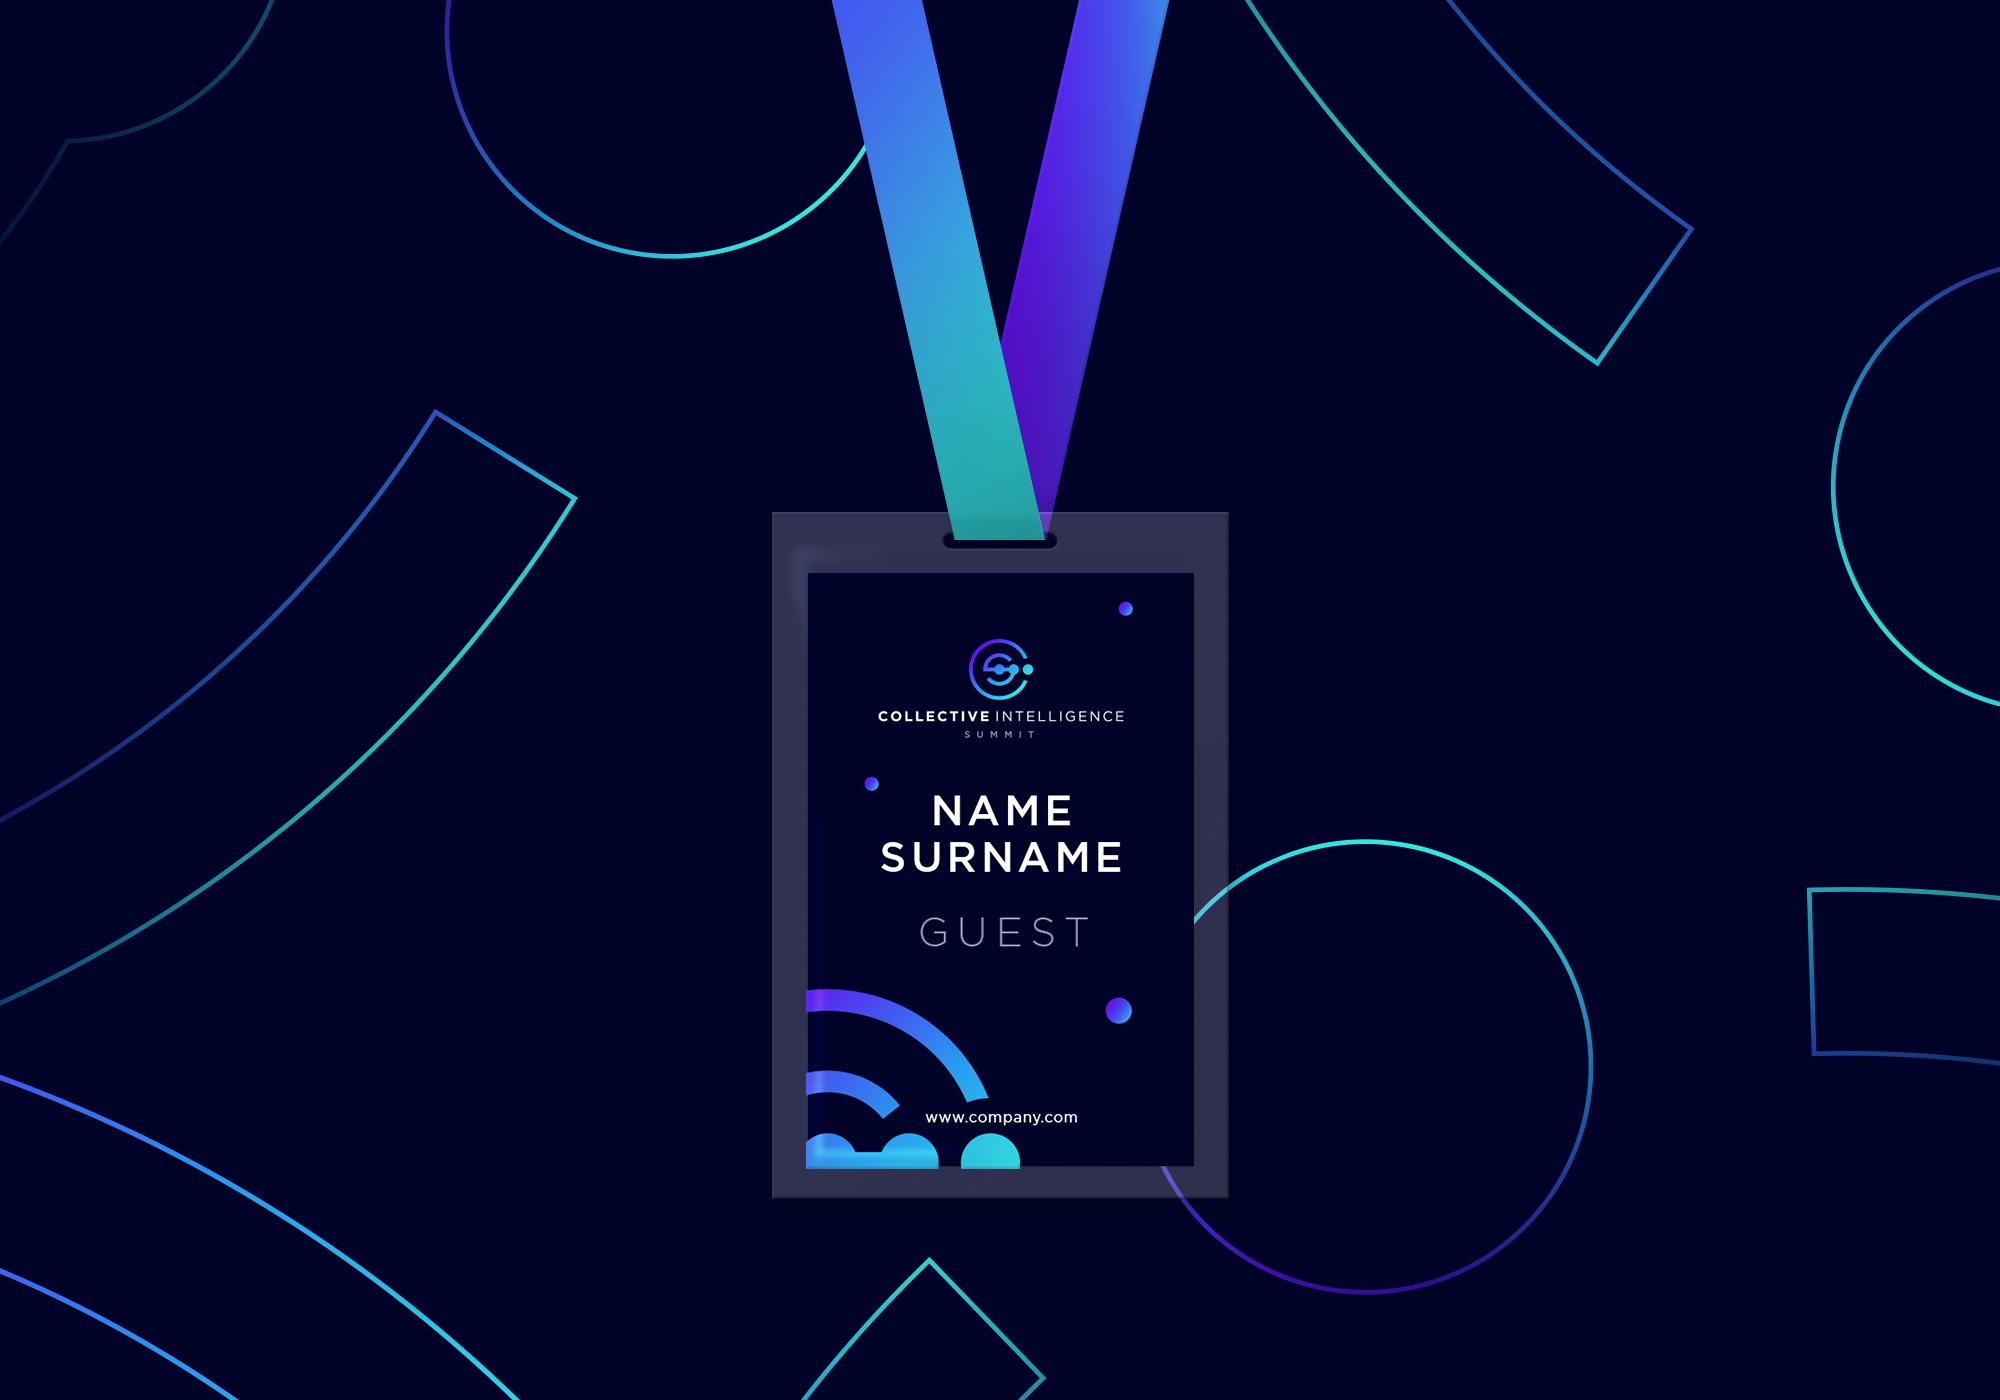 Collective Intelligence Summit Logo